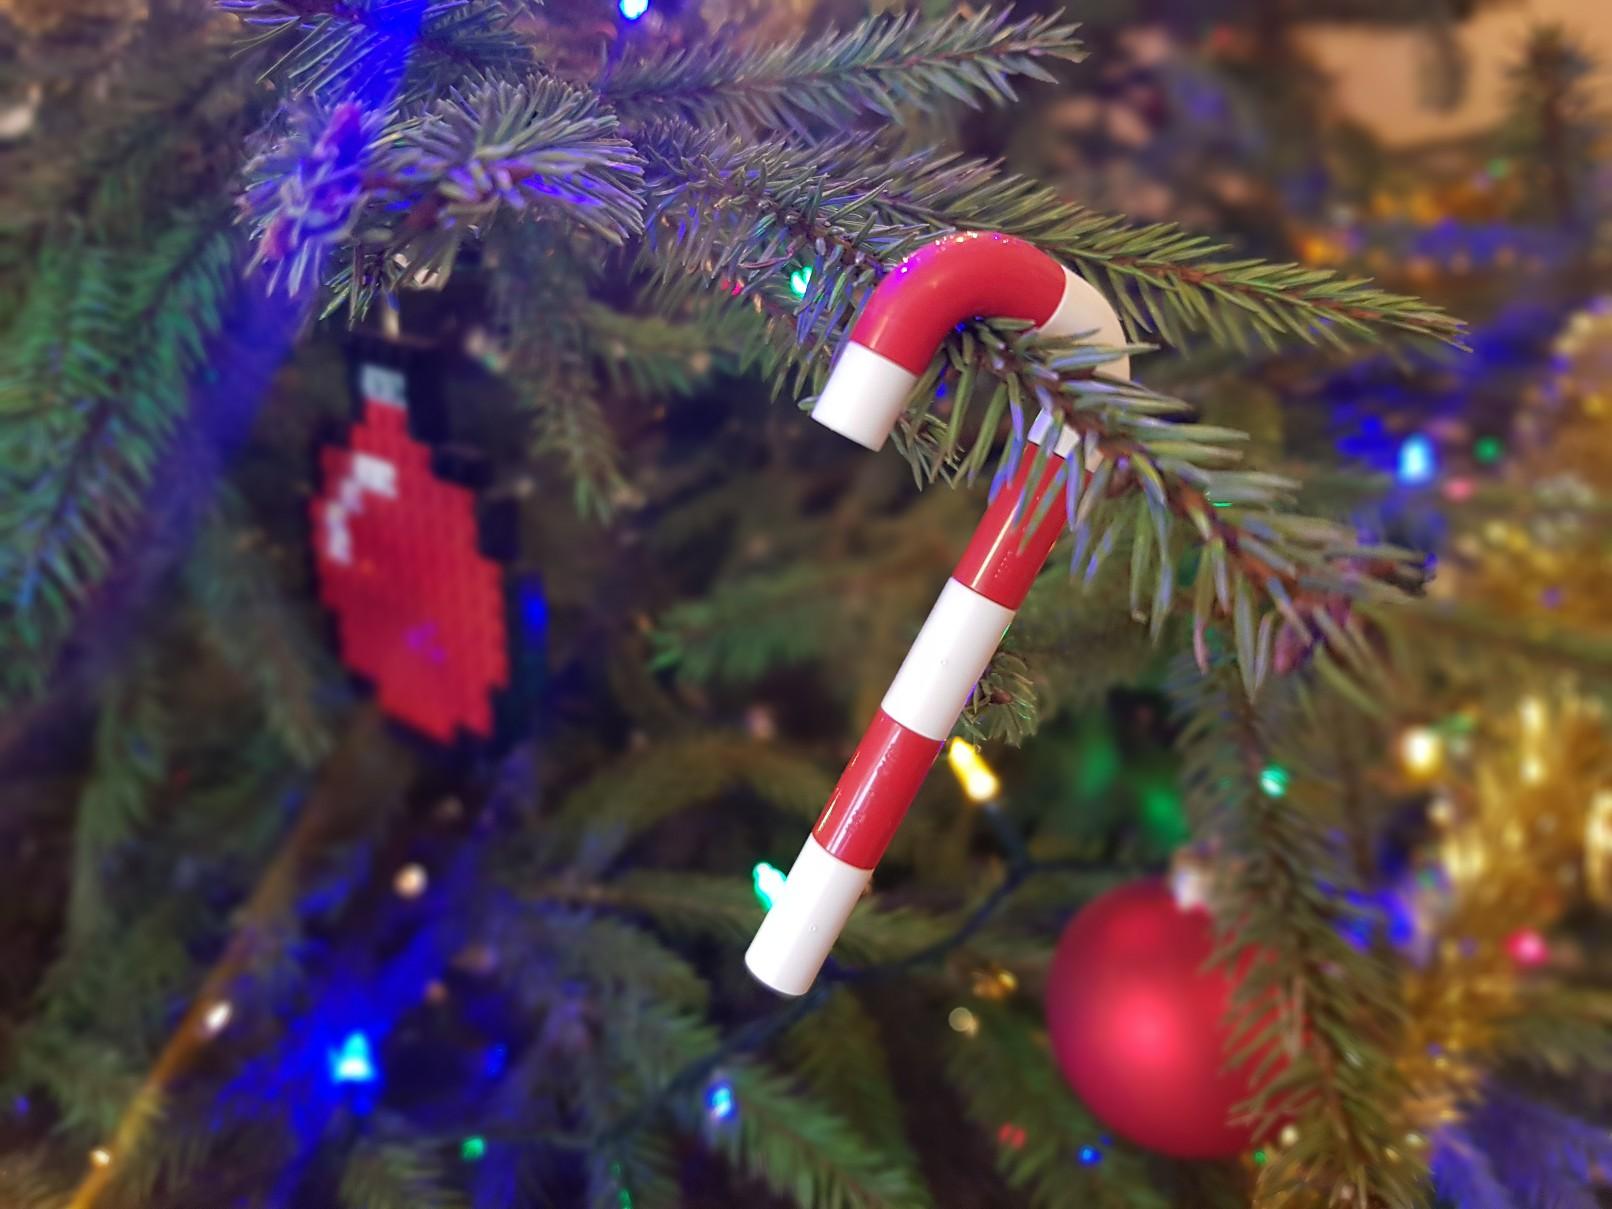 lego moc christmas baubles ornament candy stick